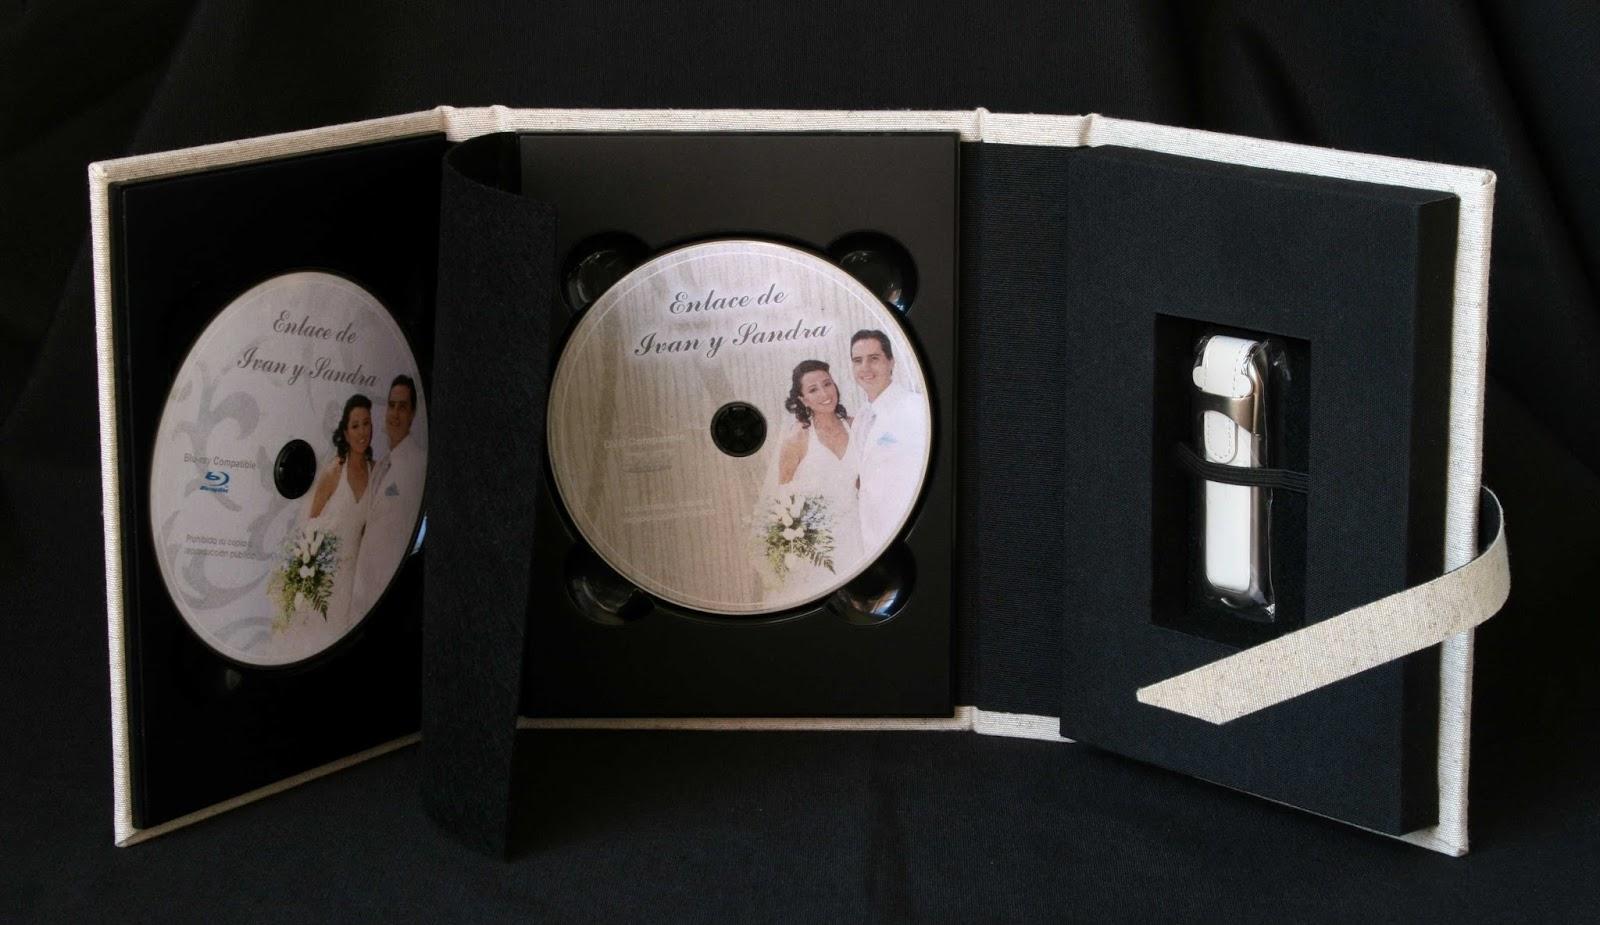 Pareja estuche 2 DVD  + 1 USB desplegado